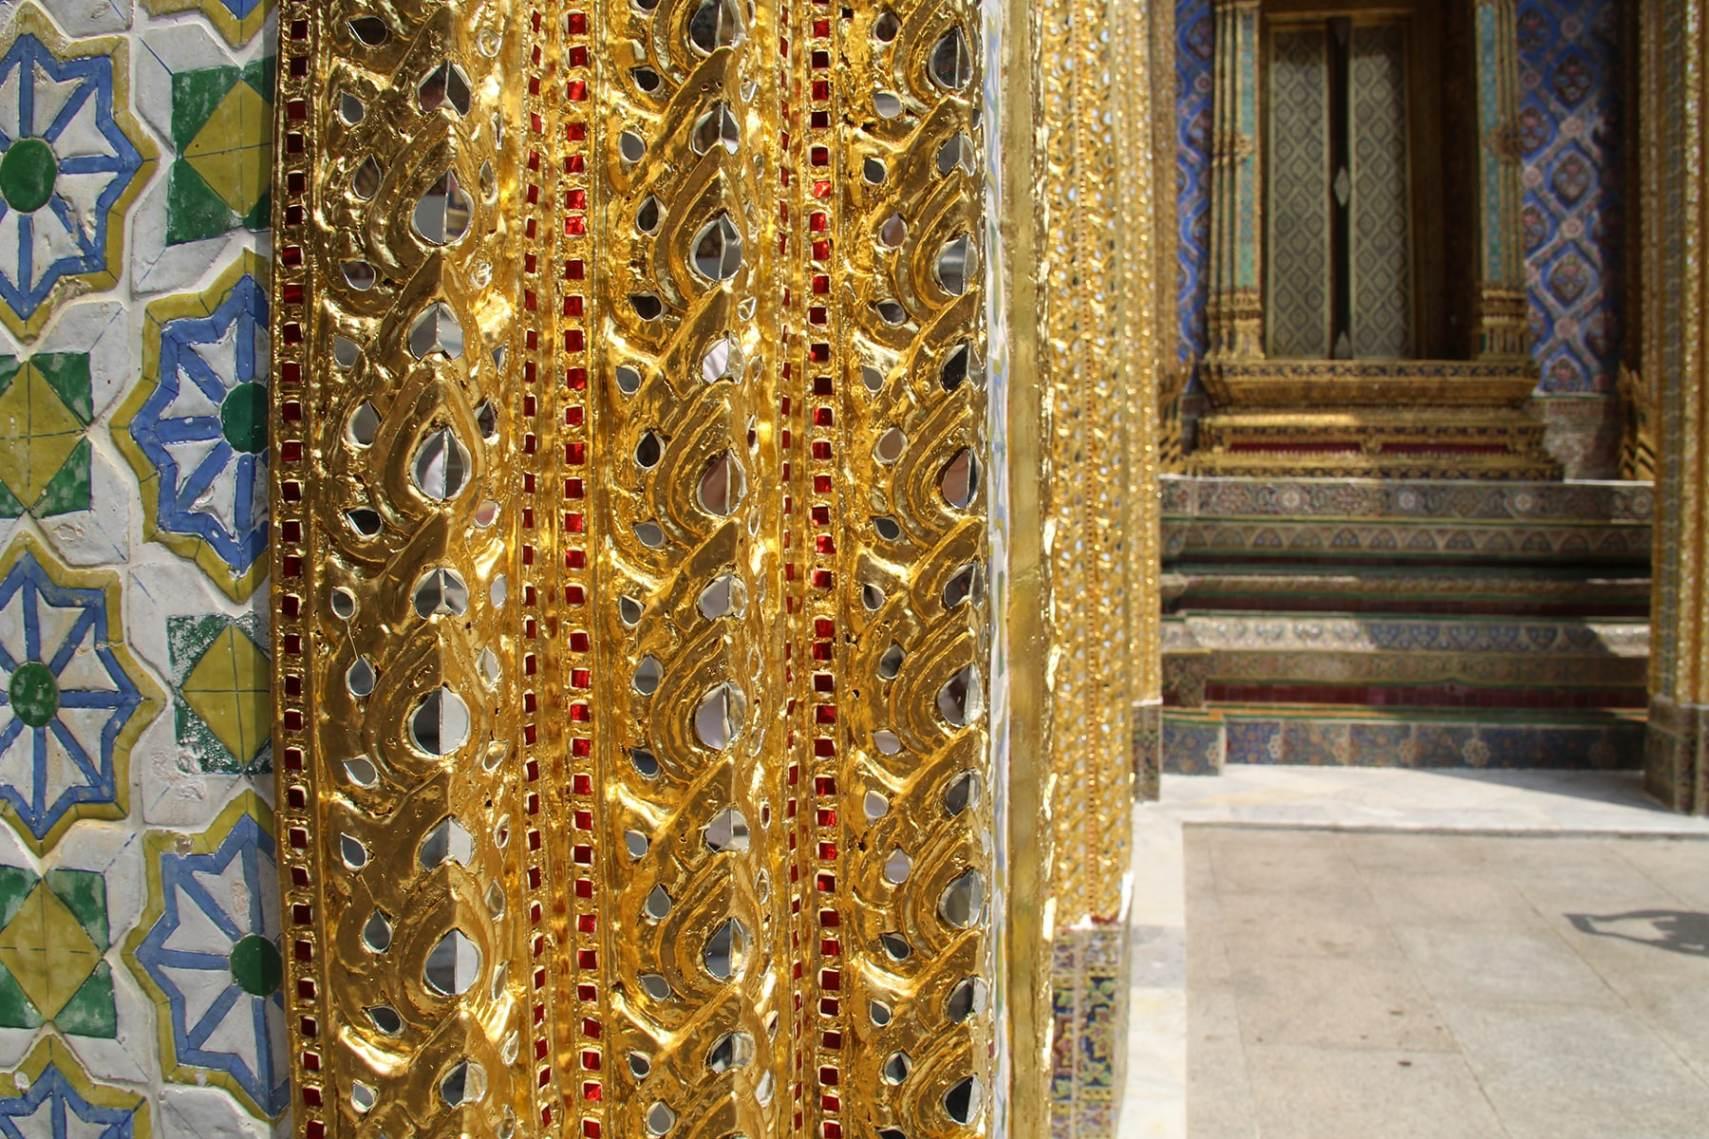 Bangkok Grand palace decorations column precious stones